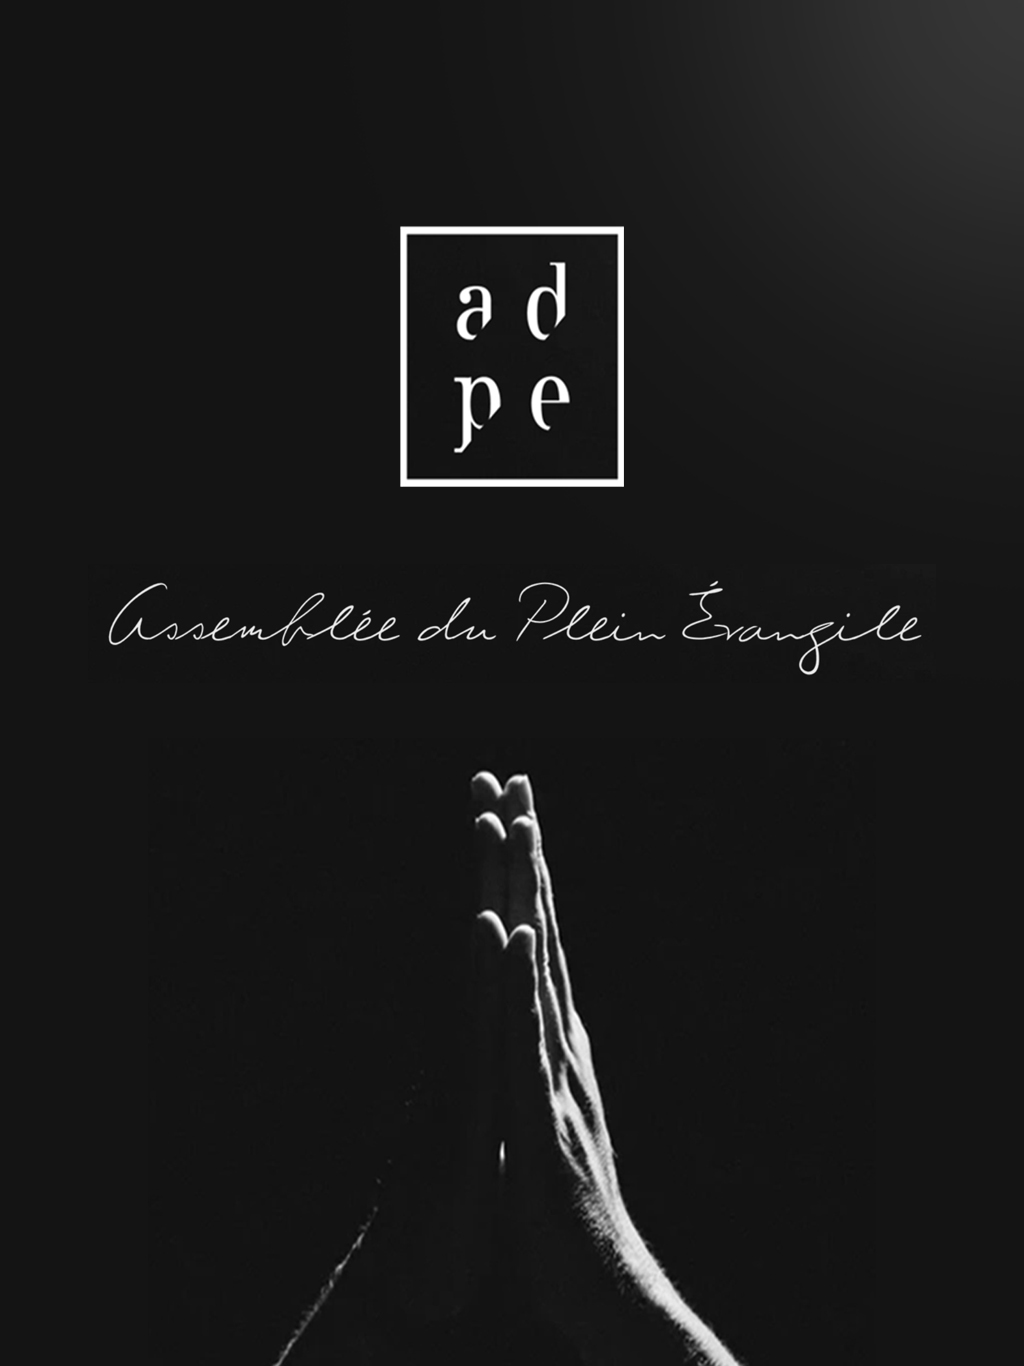 Accueil bg_tablet